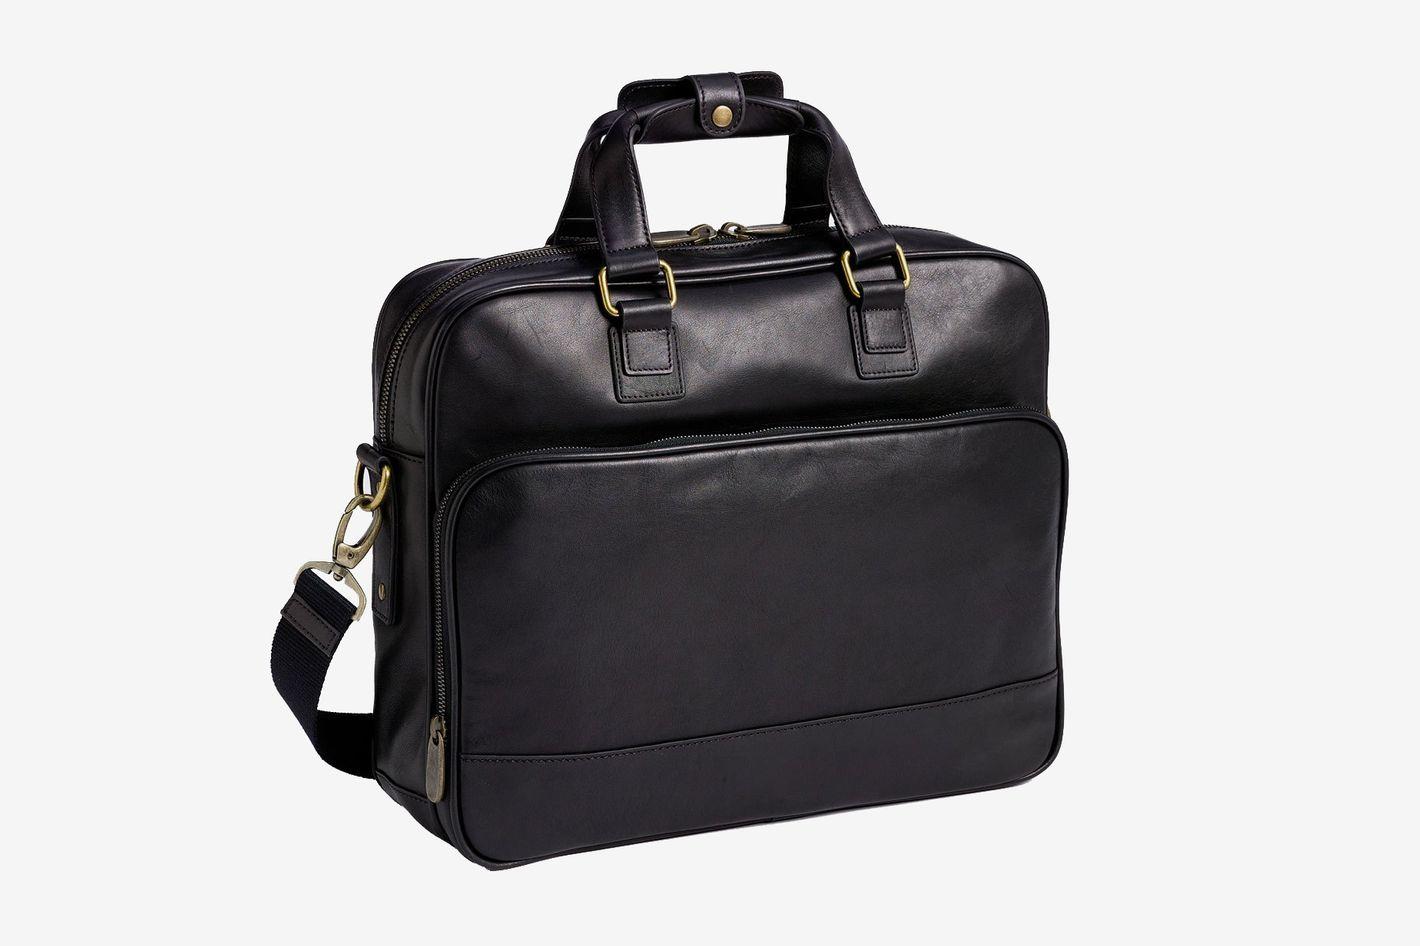 Bosca Top-Zip Leather Briefcase